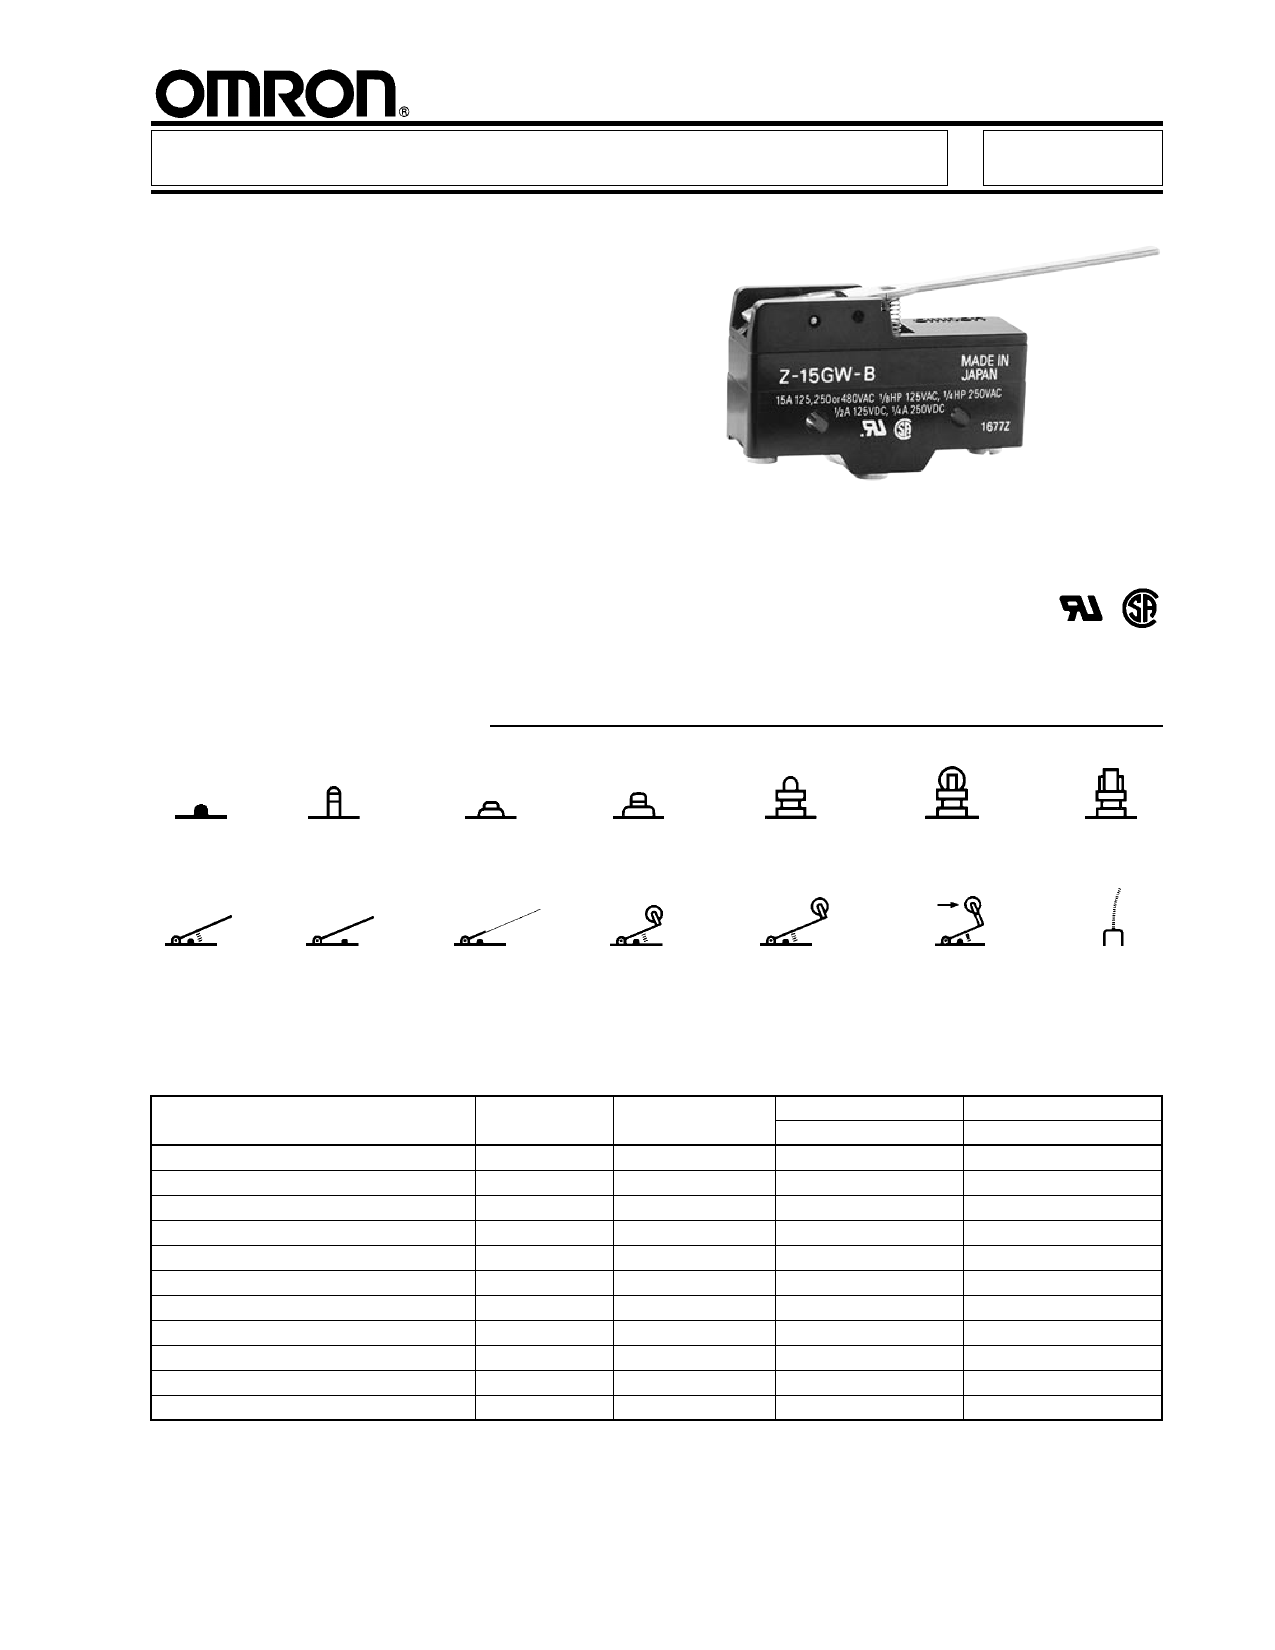 Z-15GQ21-B datasheet